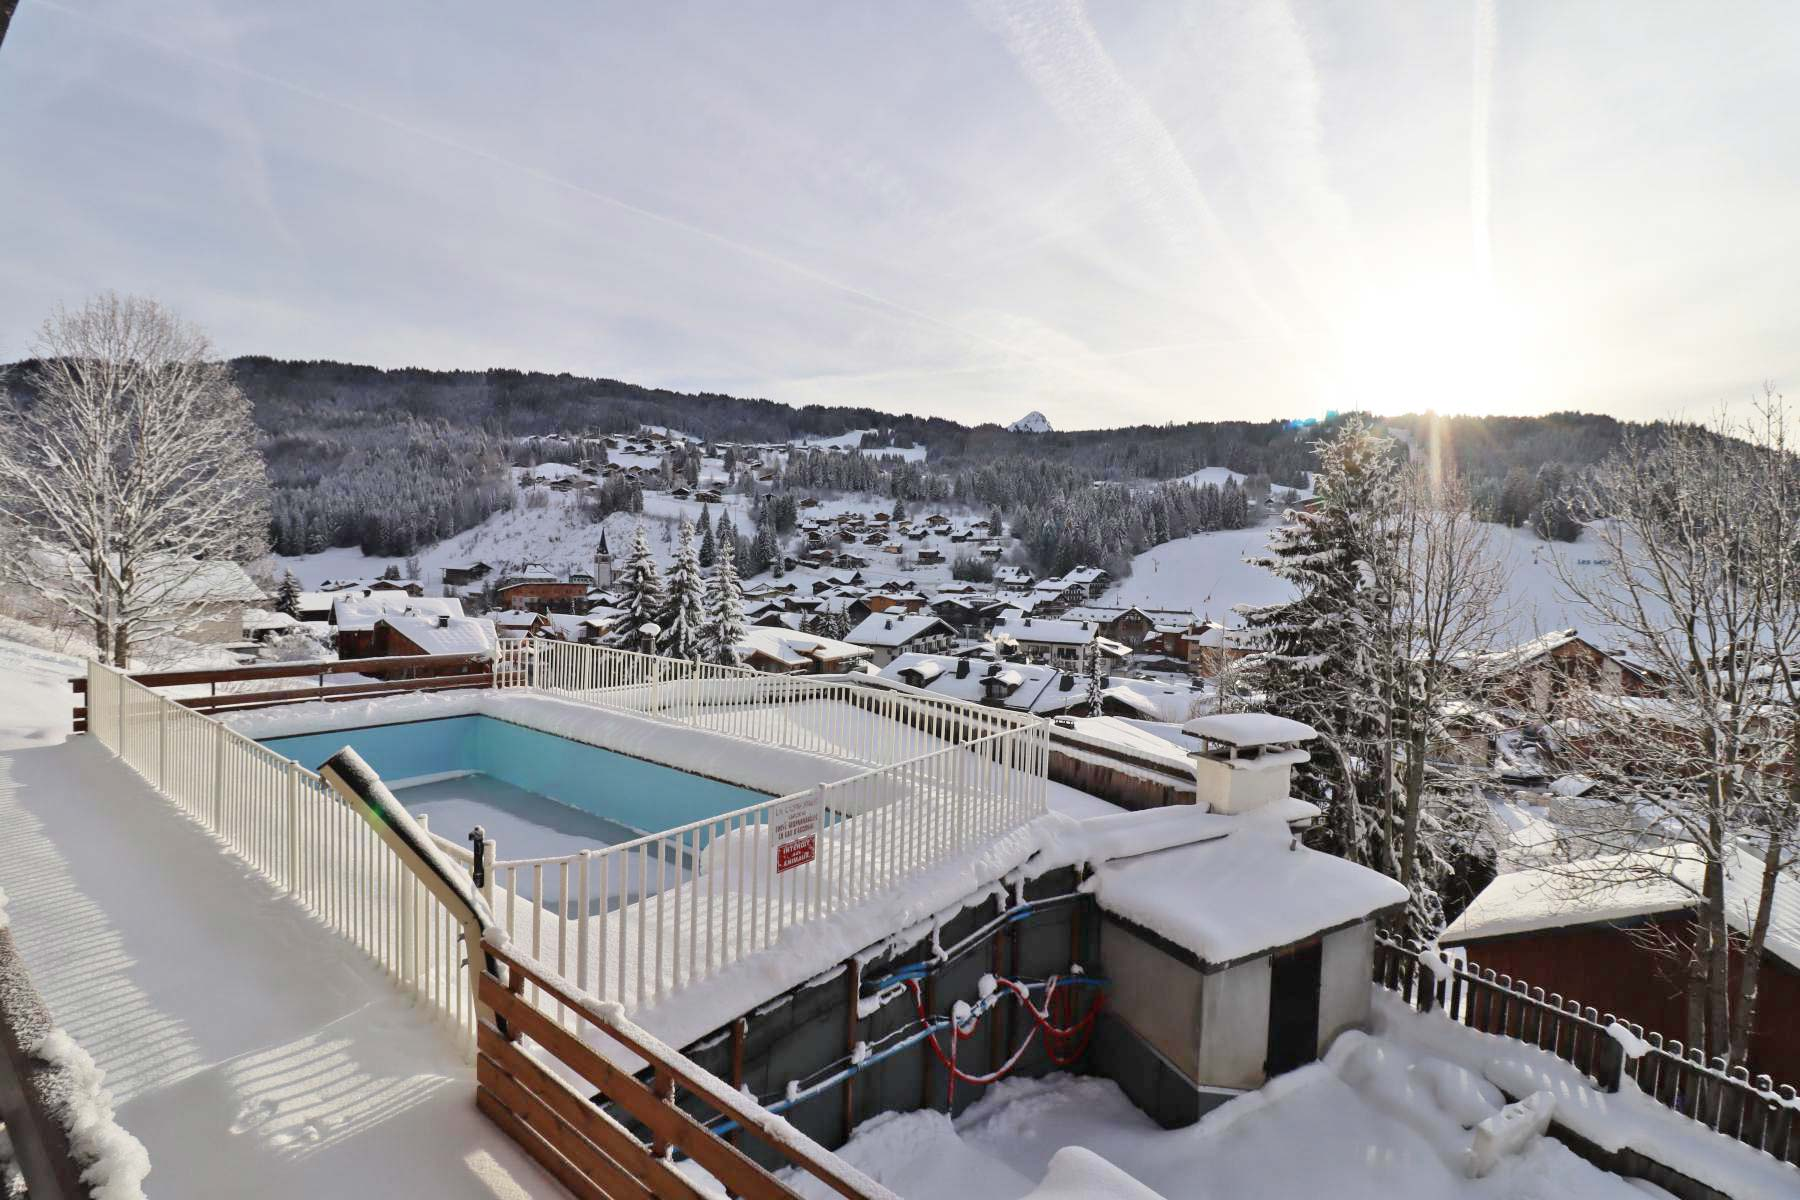 Studio appt 822 Pool in winter